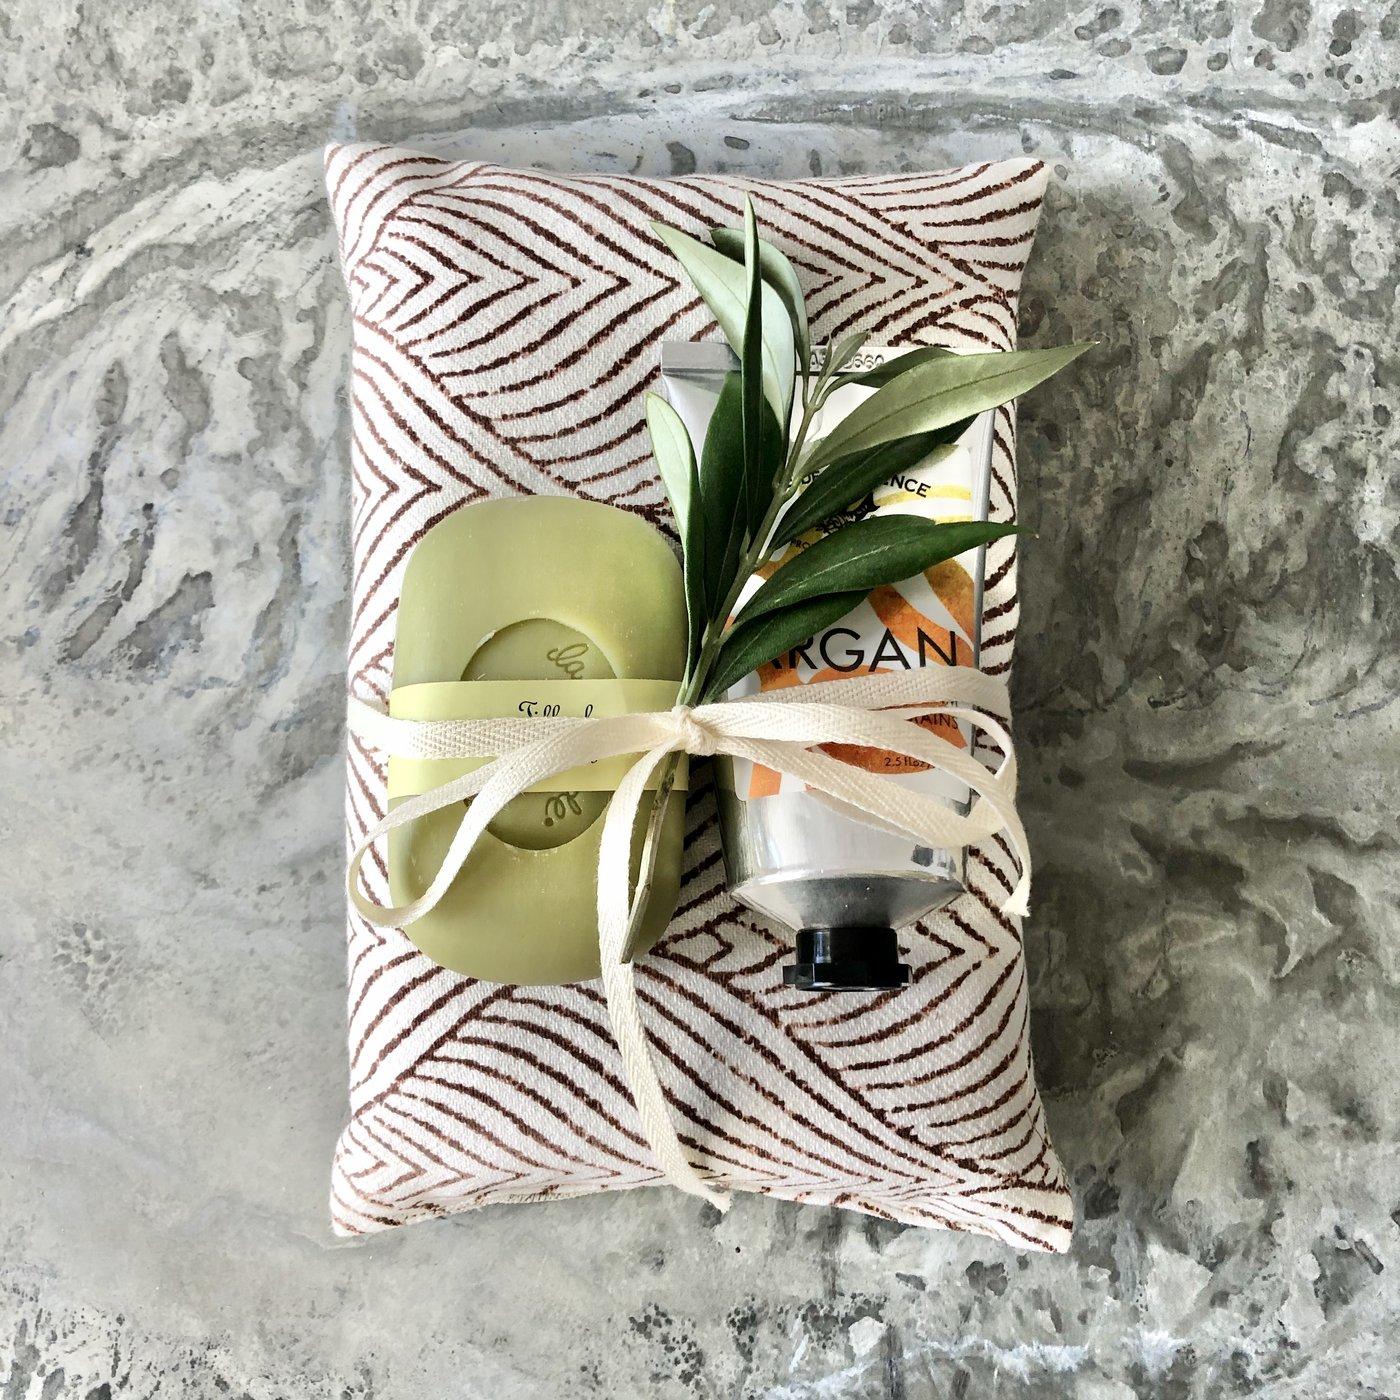 tancredi & morgen care package